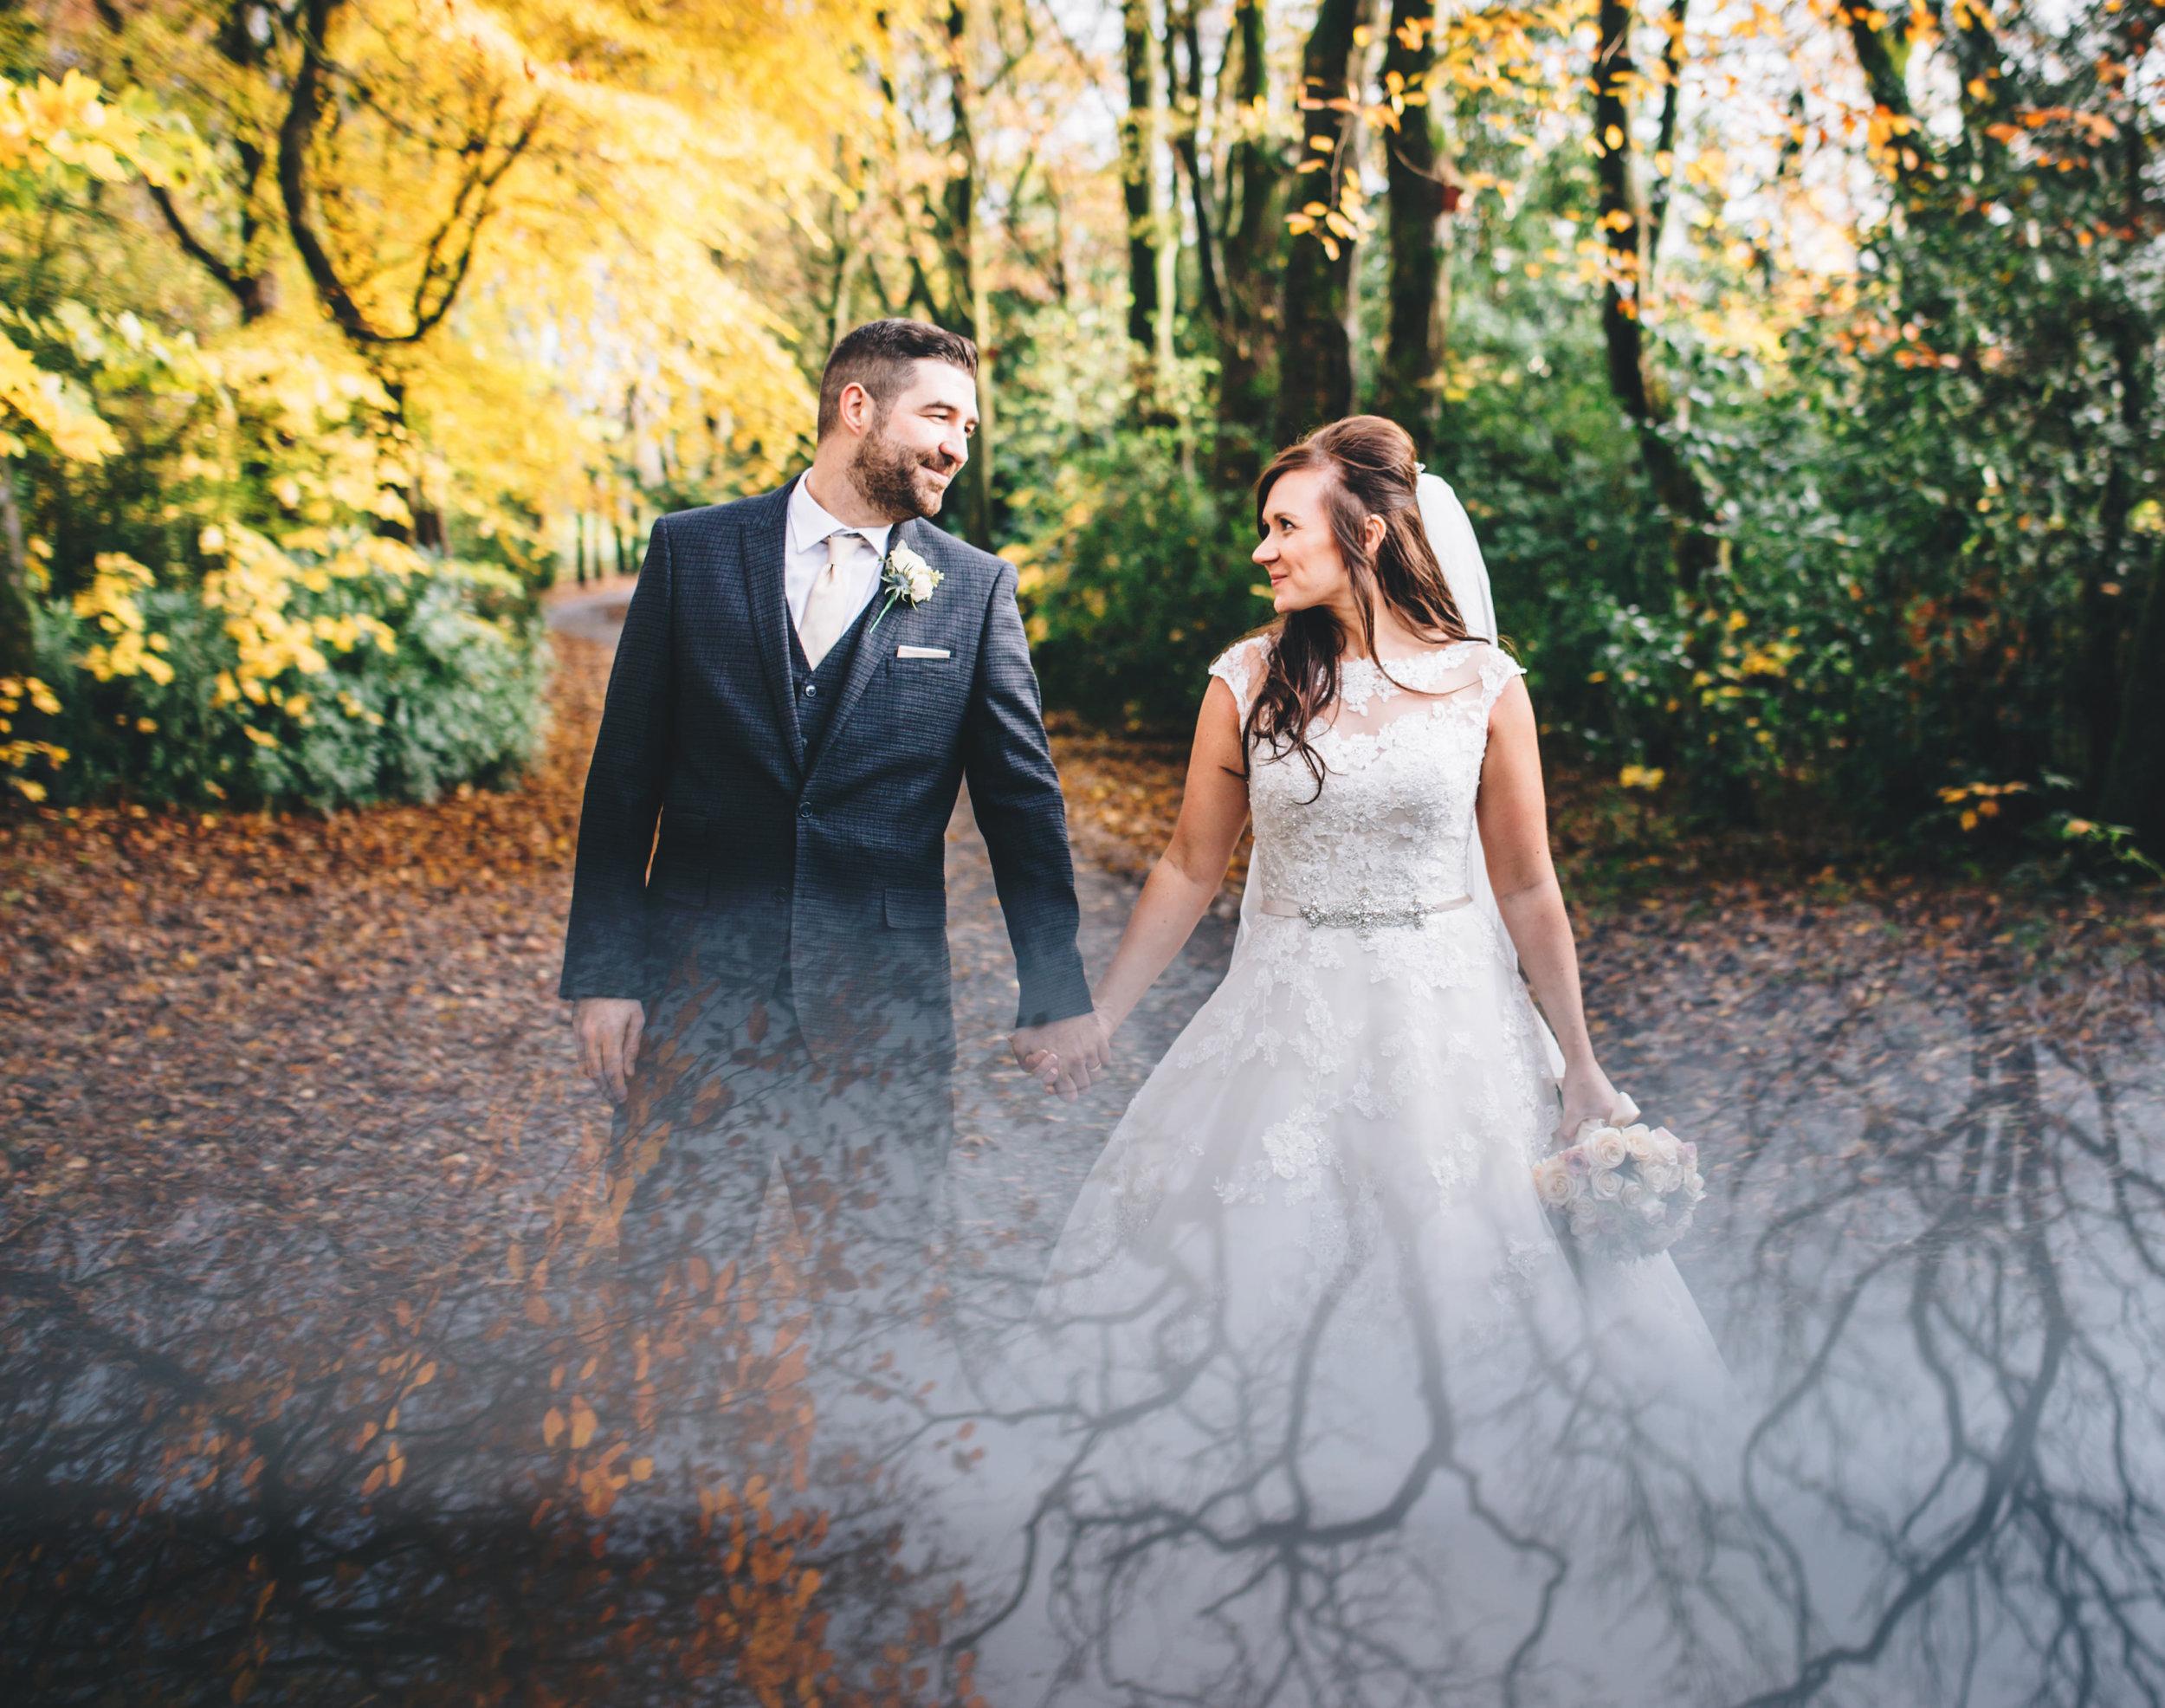 creative wedding images at Ashfield House Lancashire